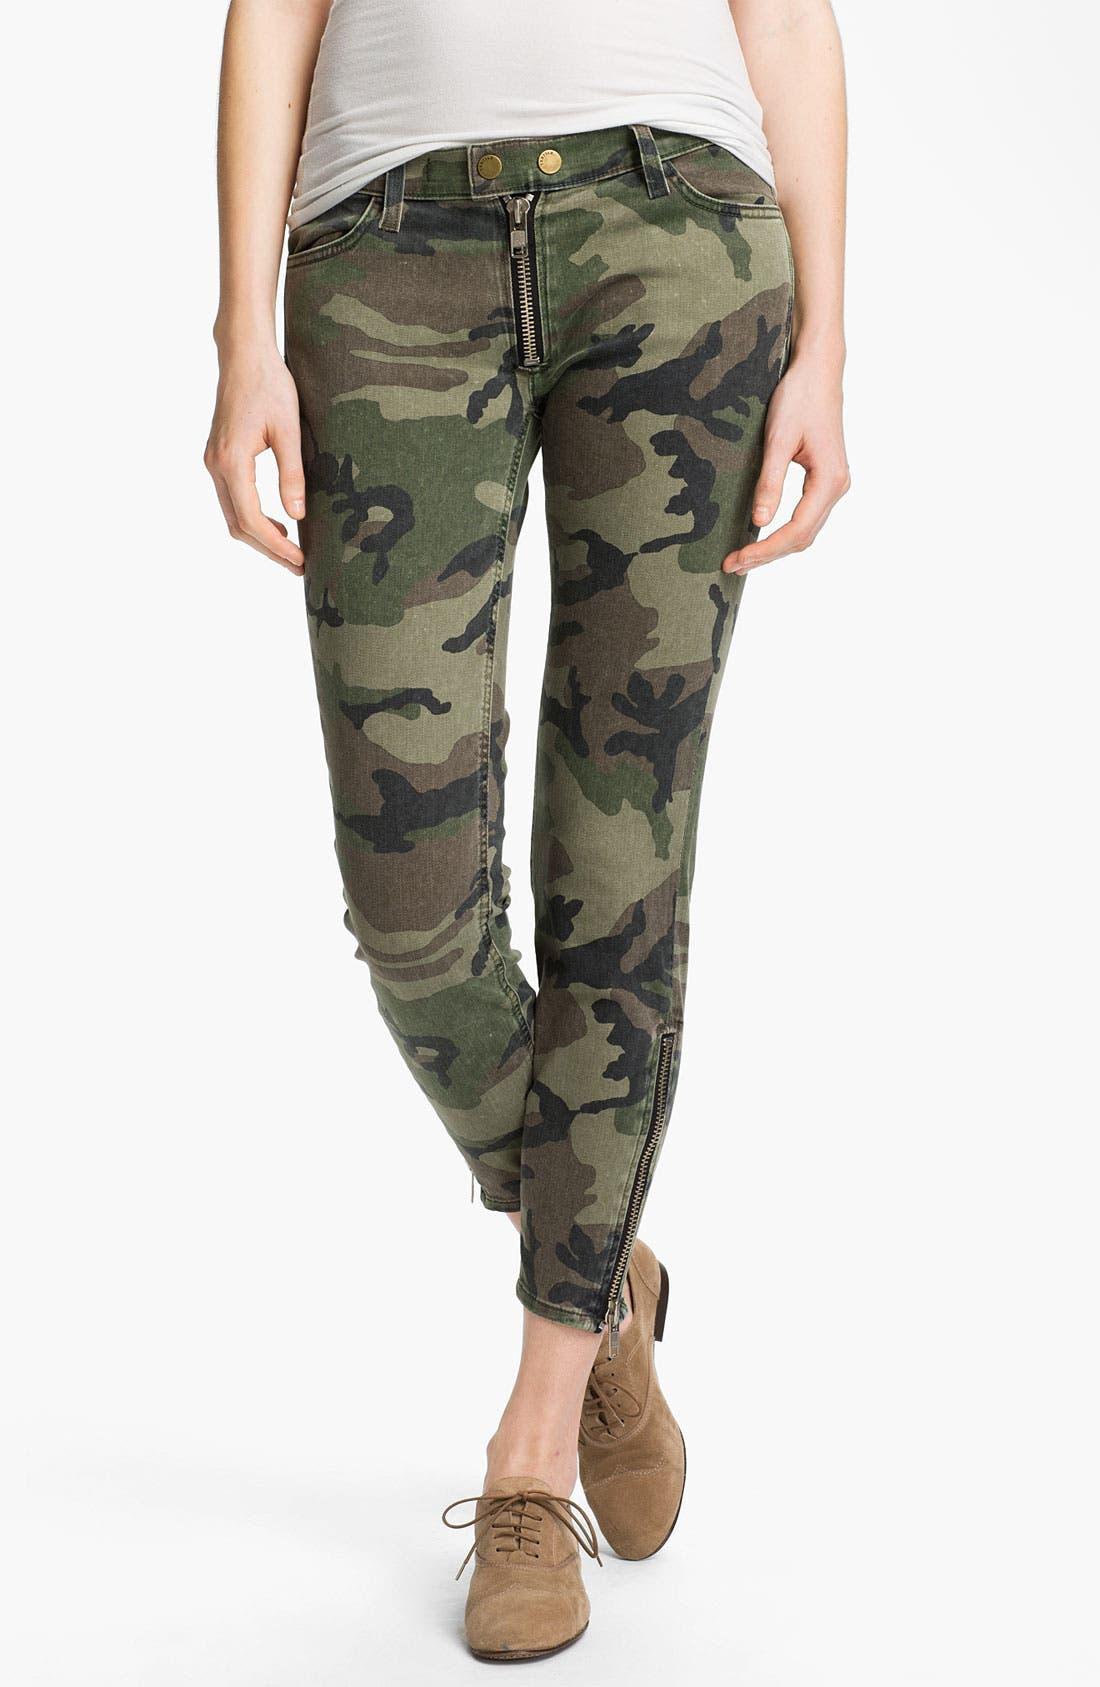 Alternate Image 1 Selected - TEXTILE Elizabeth and James 'Cooper' Skinny Camo Print Jeans